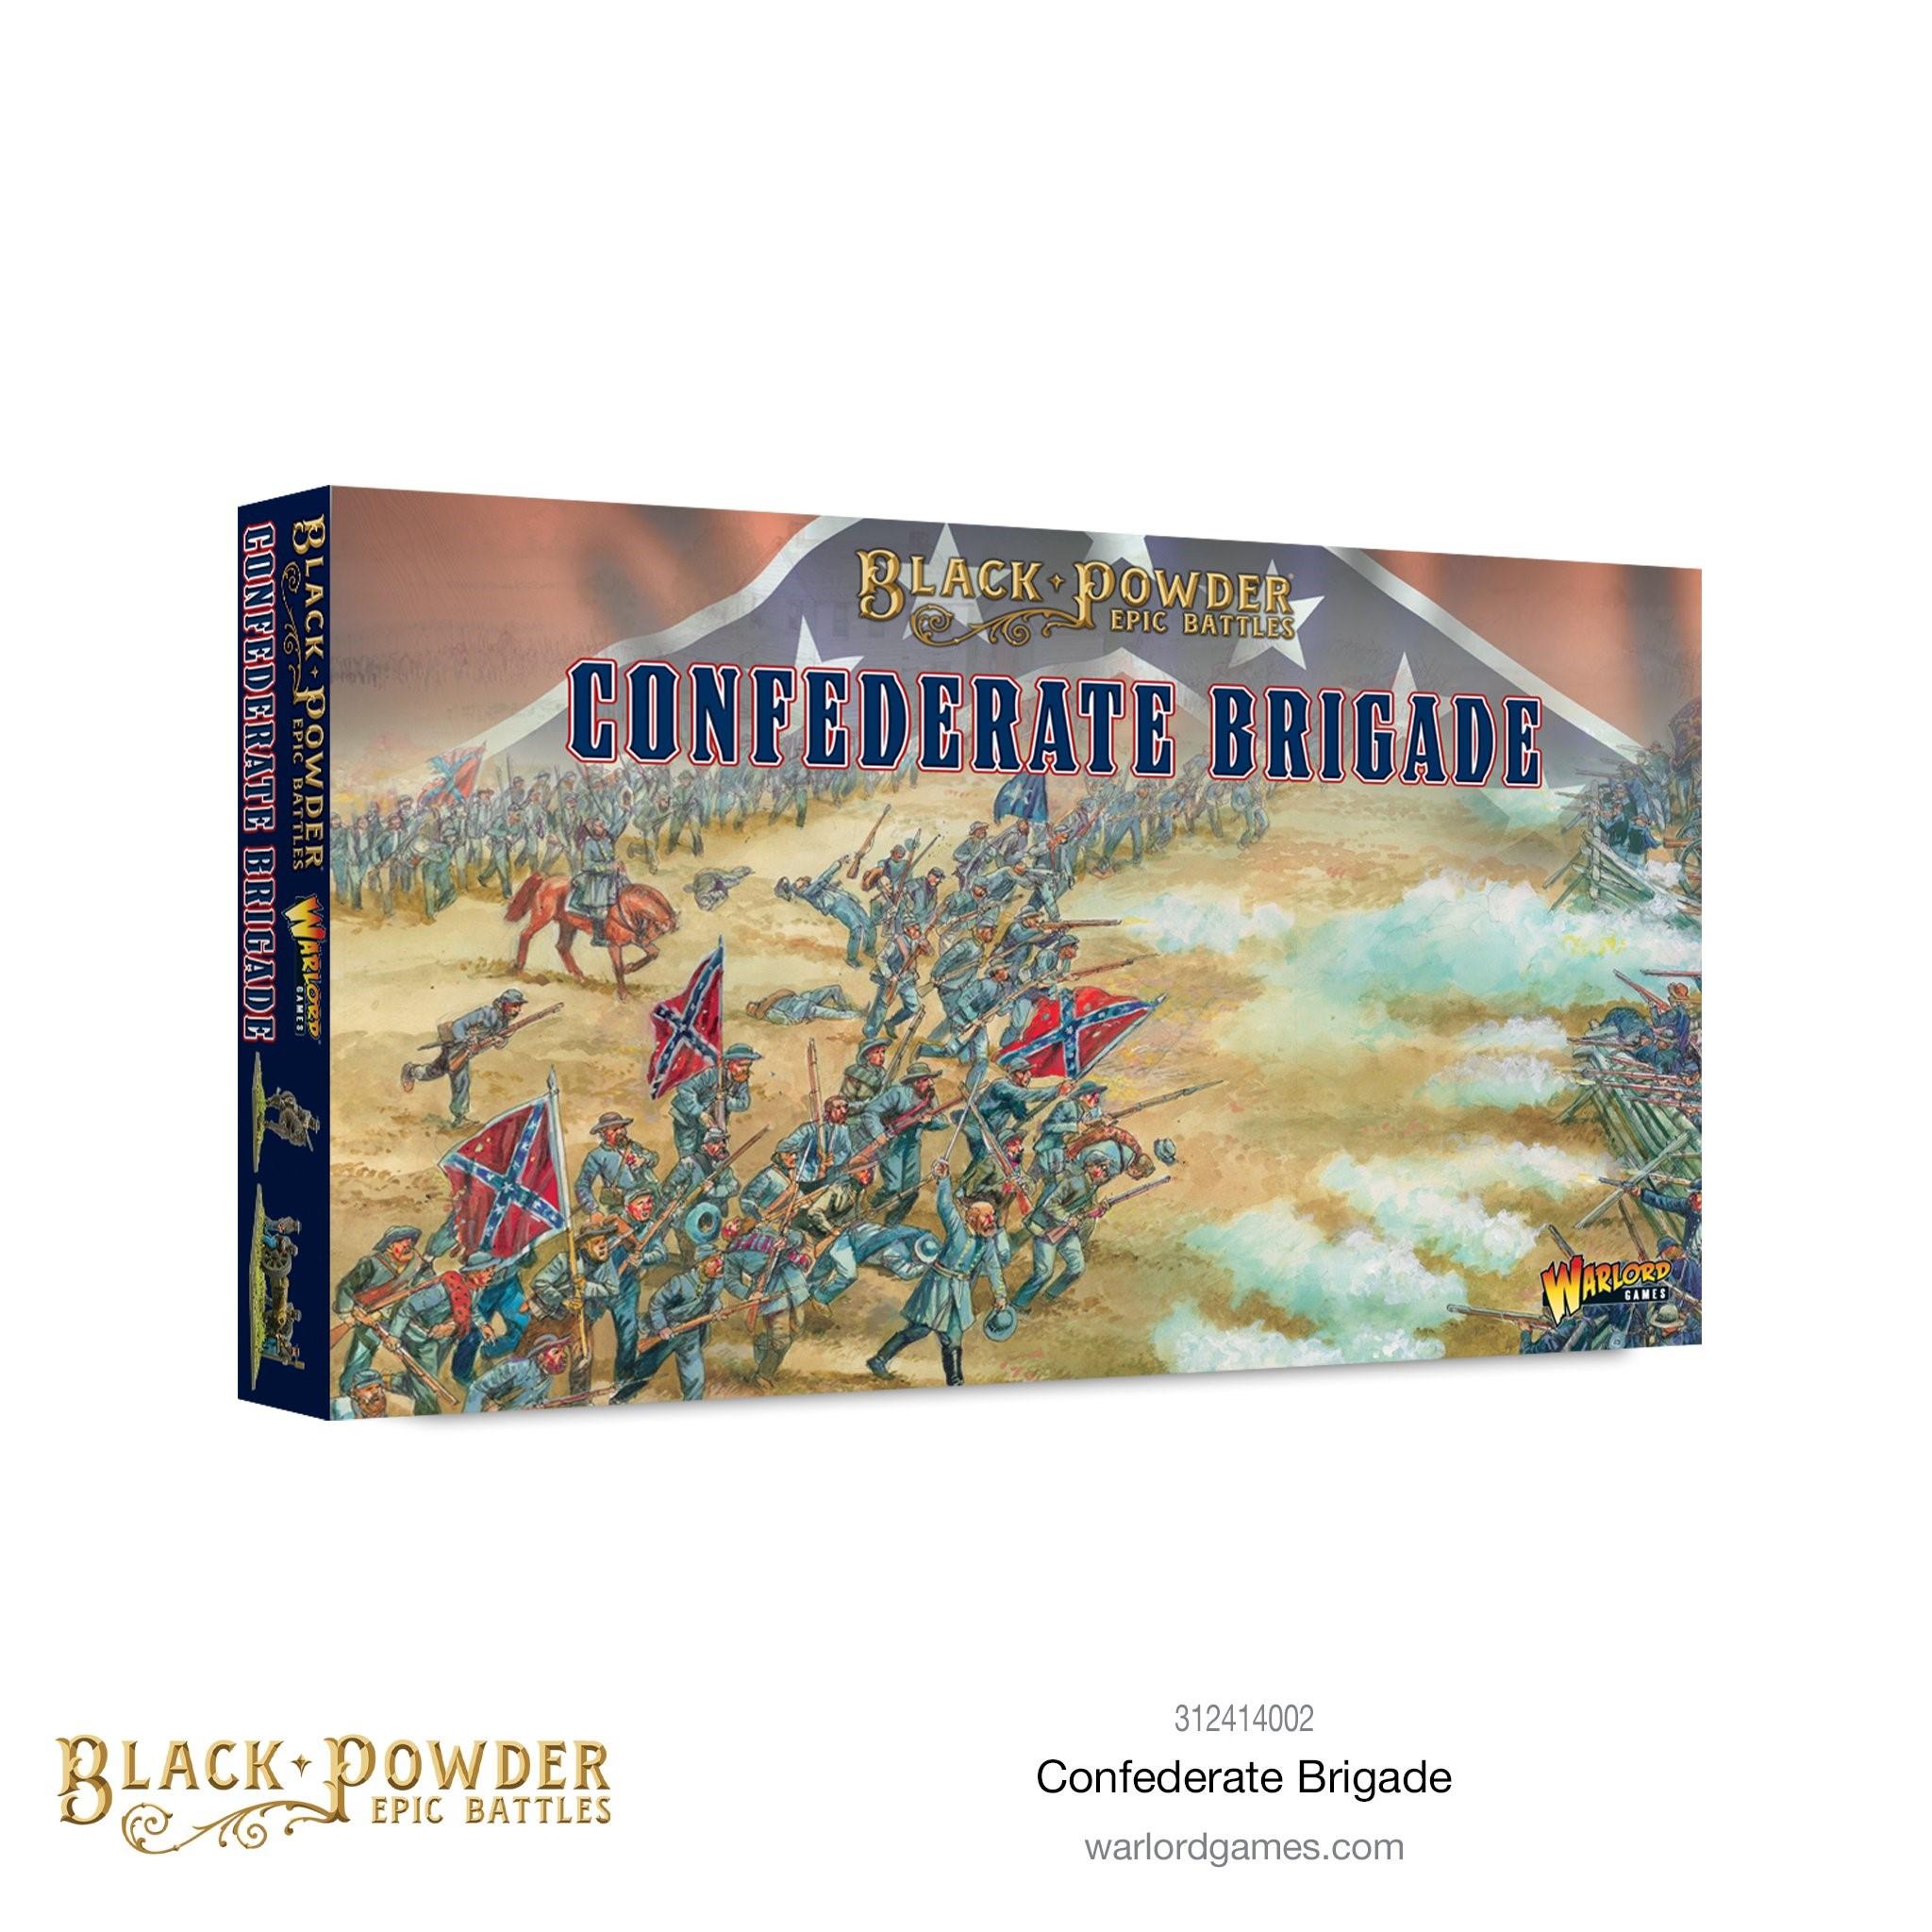 Black Powder Epic Battles : American Civil War Confederate Brigade